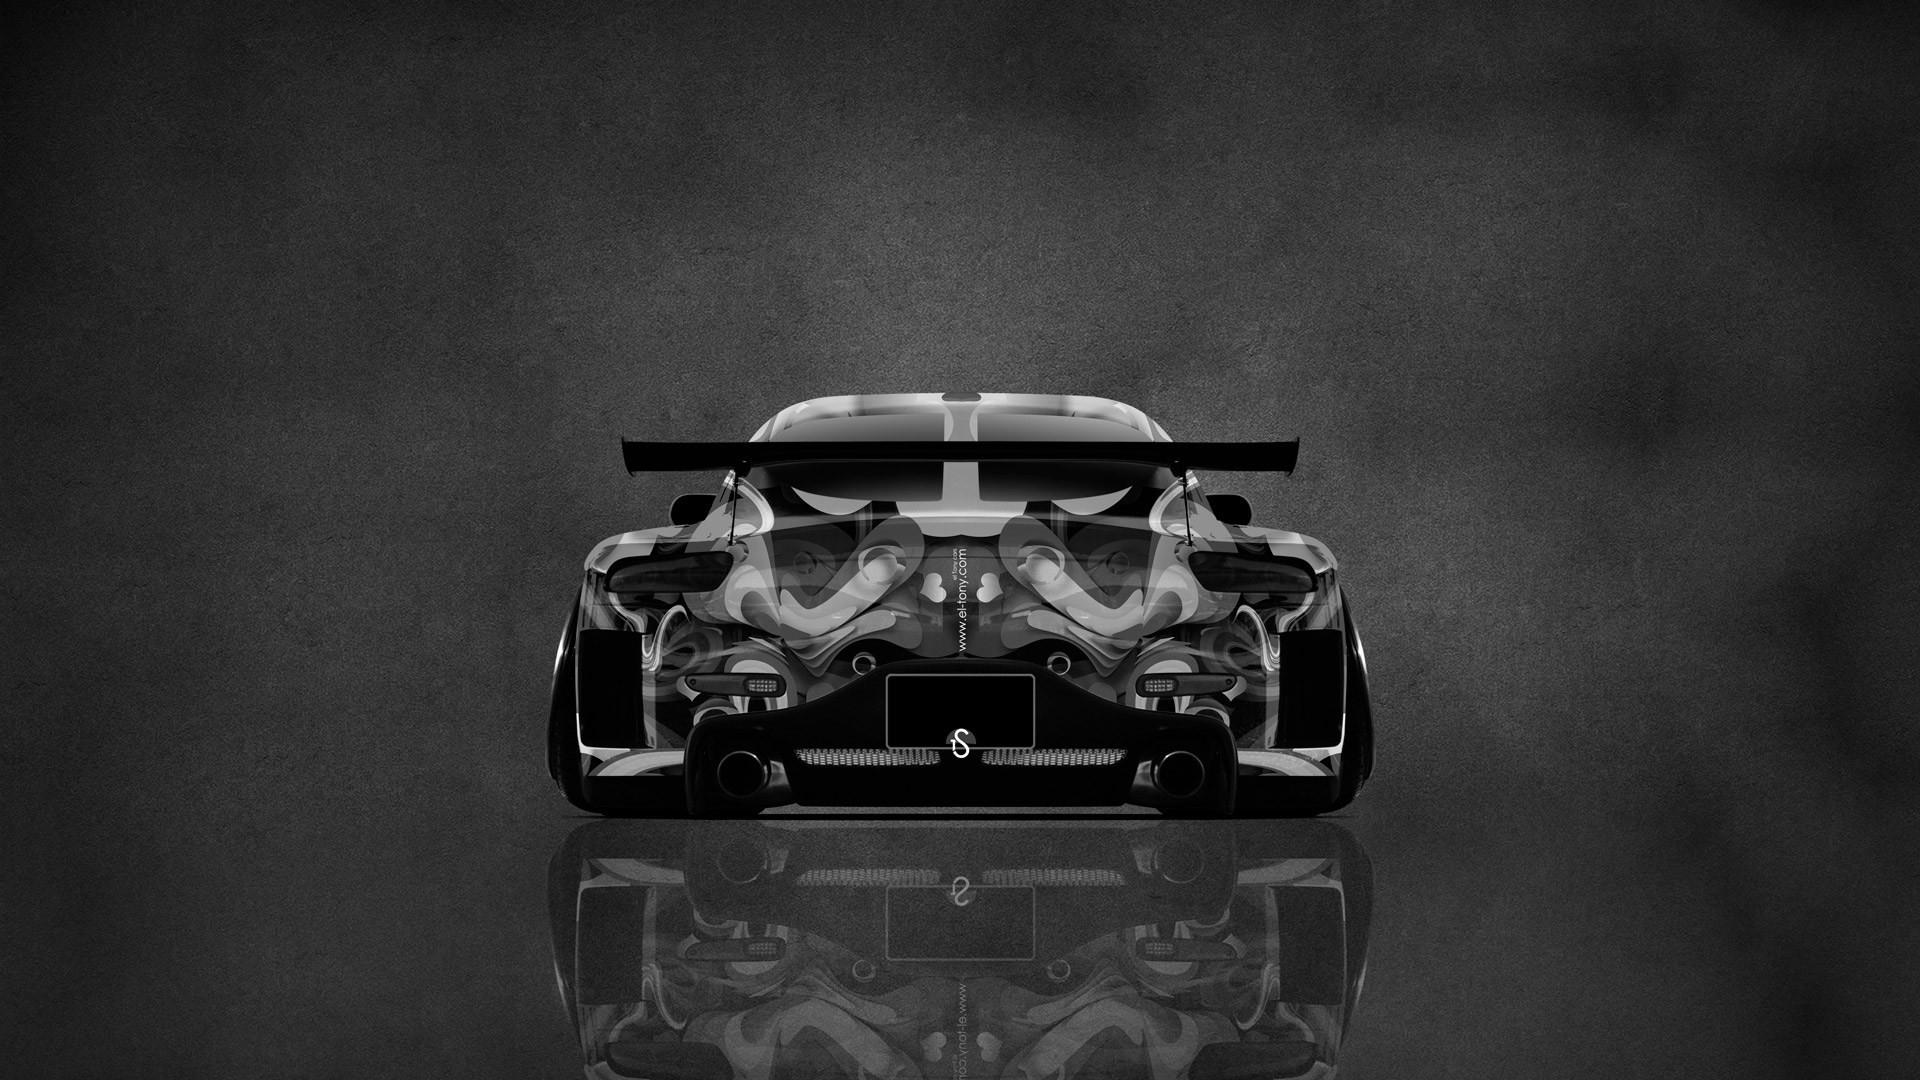 1920x1080 Acura Nsx Honda Nsx Coupe Tuning Veilside Supercars Cars .